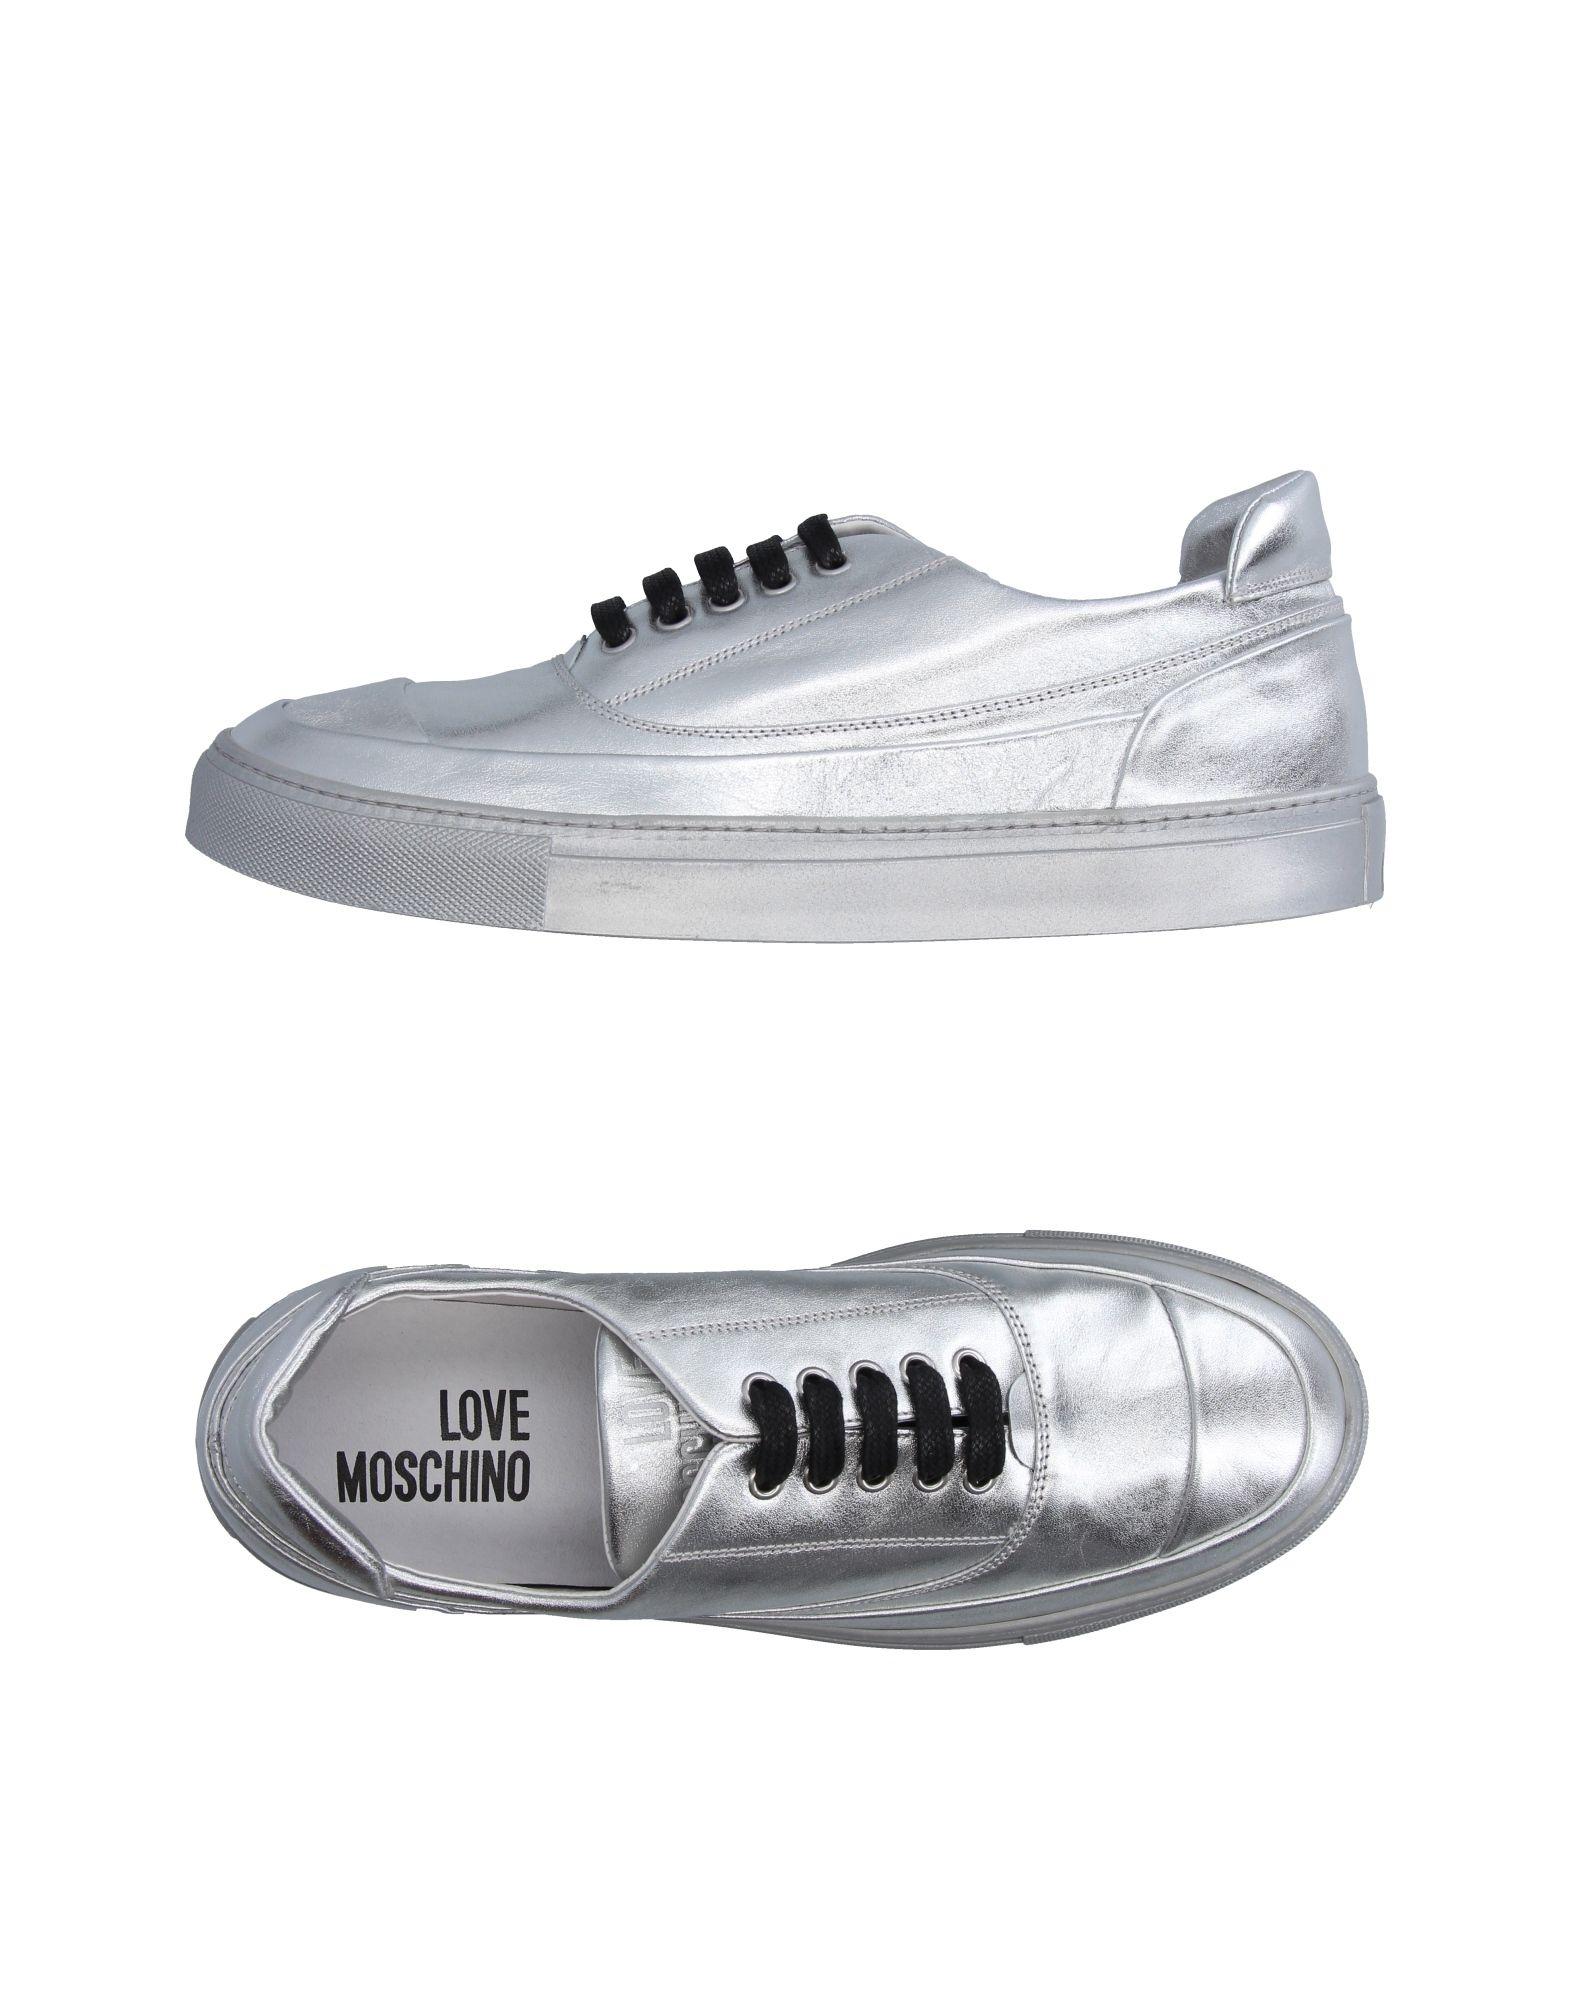 Love Moschino Sneakers Herren  11224911LV Gute Qualität beliebte Schuhe